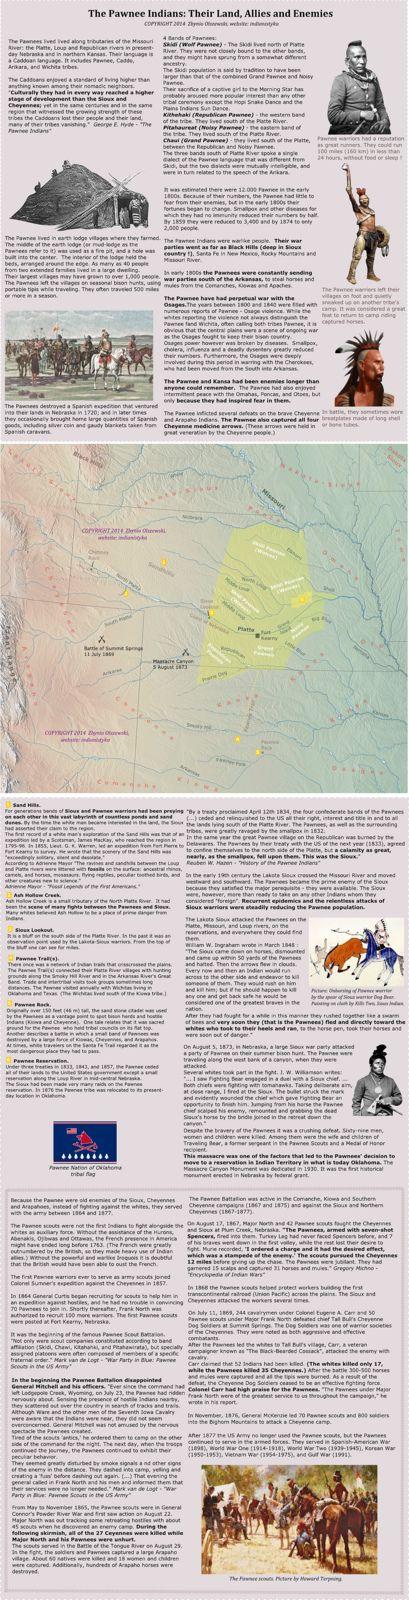 PawneeIndianstribelandsboundaries Map of the tribal lau2026